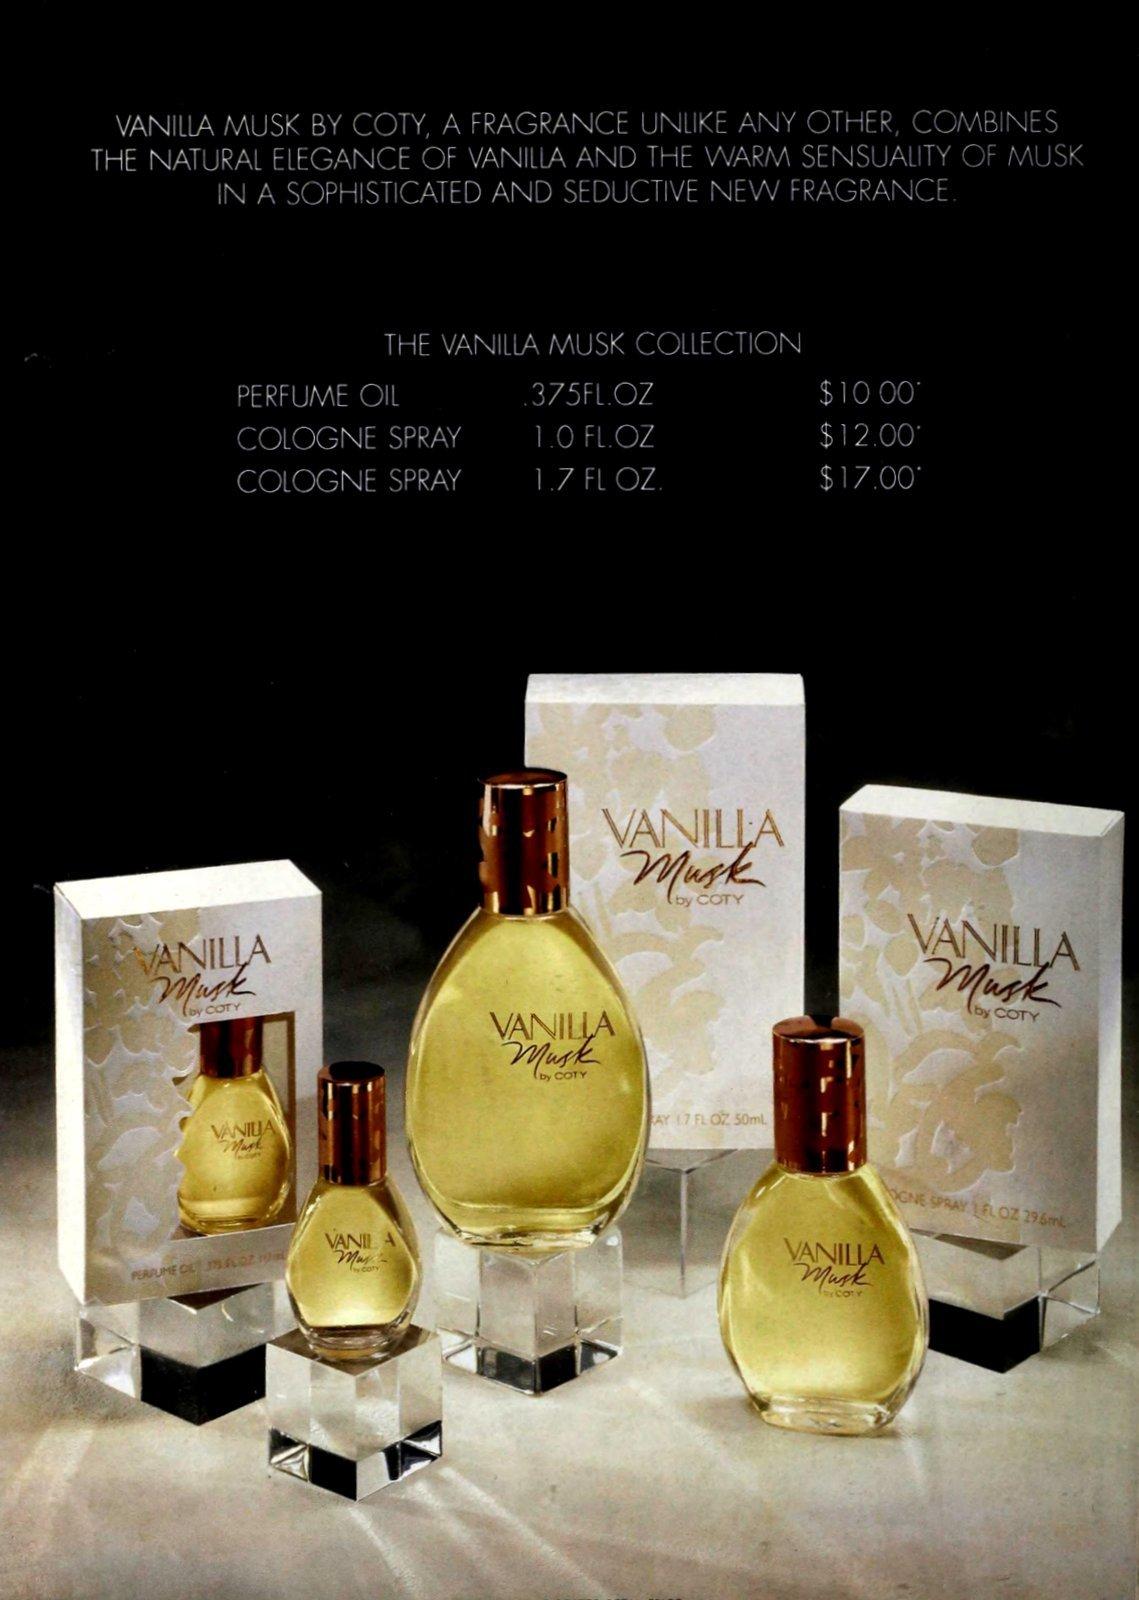 Vanilla Musk by Coty (1994) at ClickAmericana.com